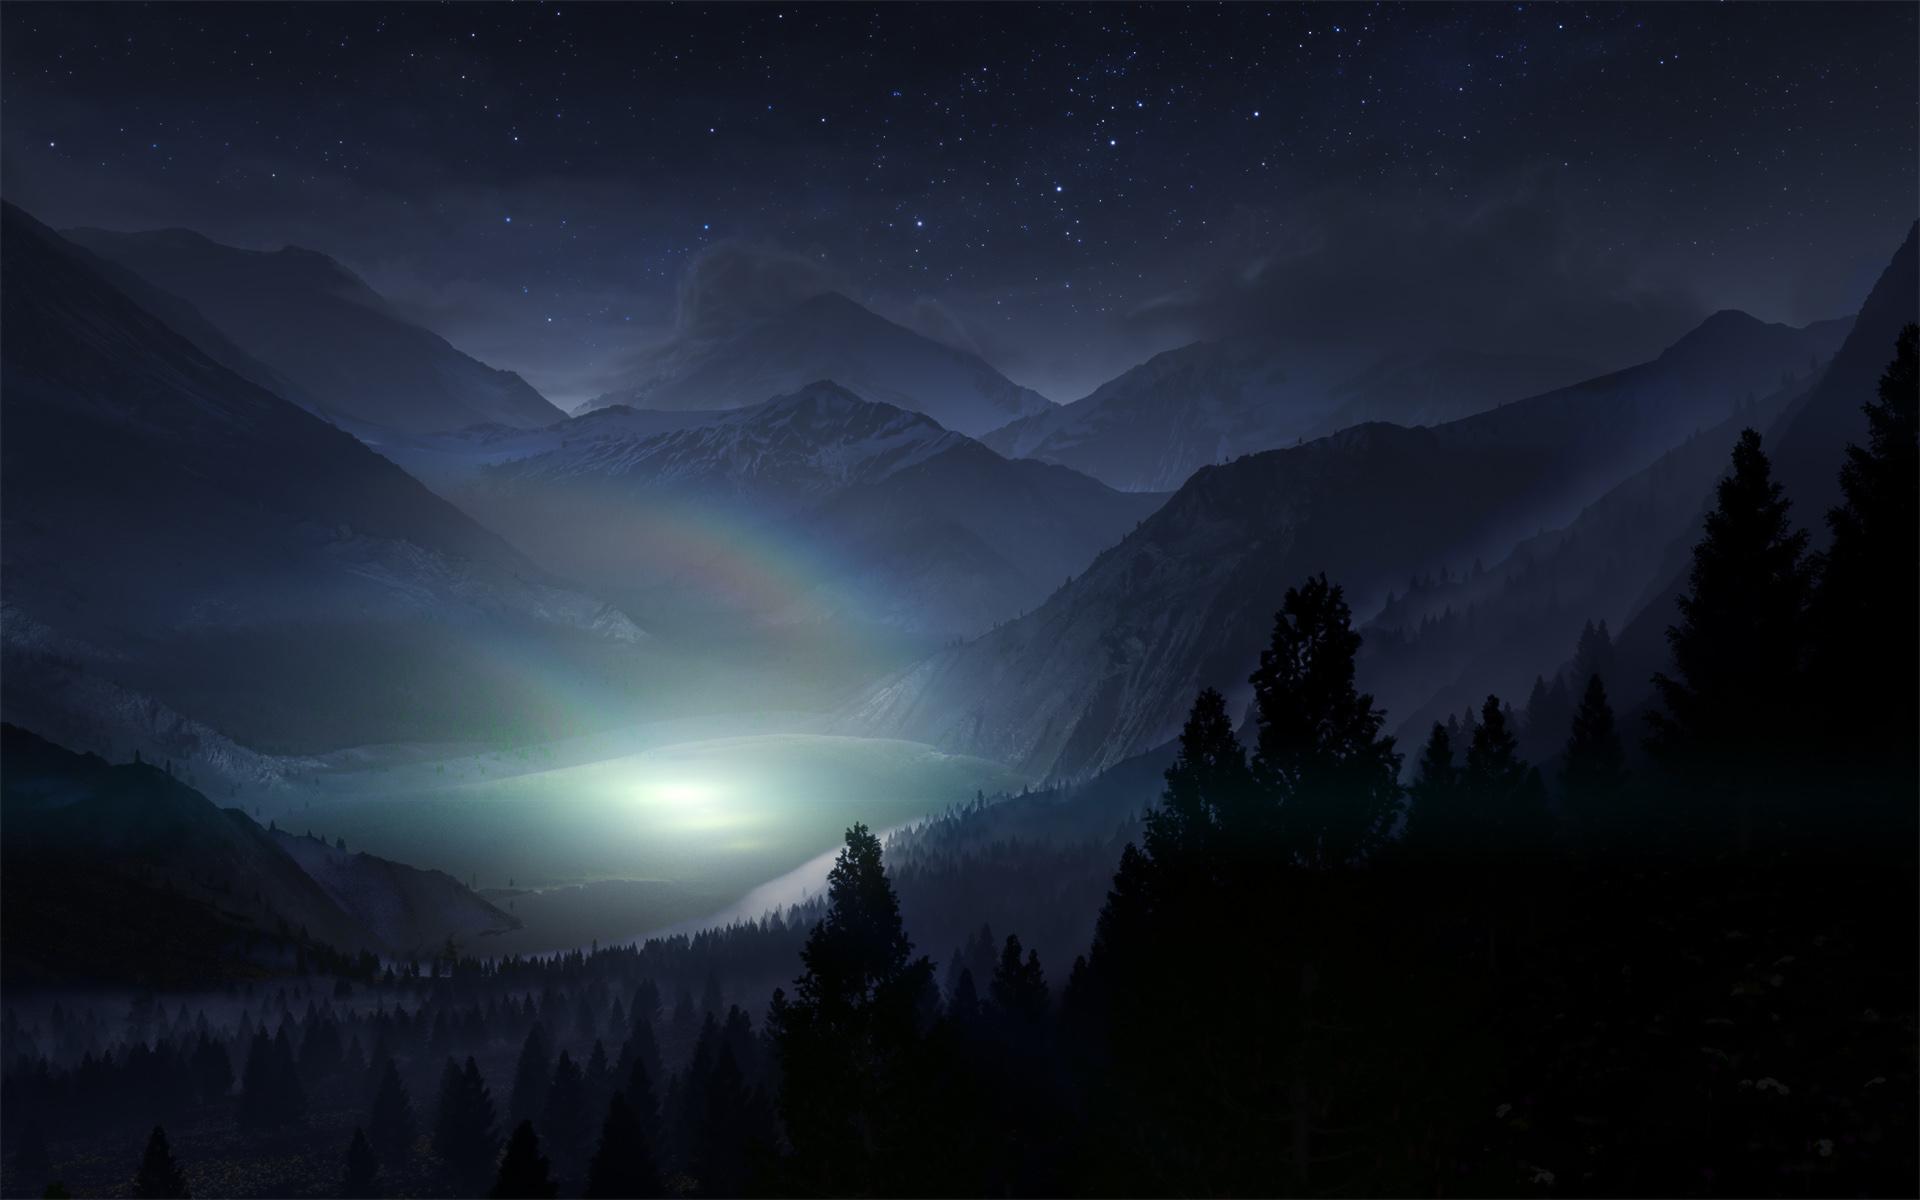 lake night cg stars trees mountains landscape wallpaper lake night cg 1920x1200